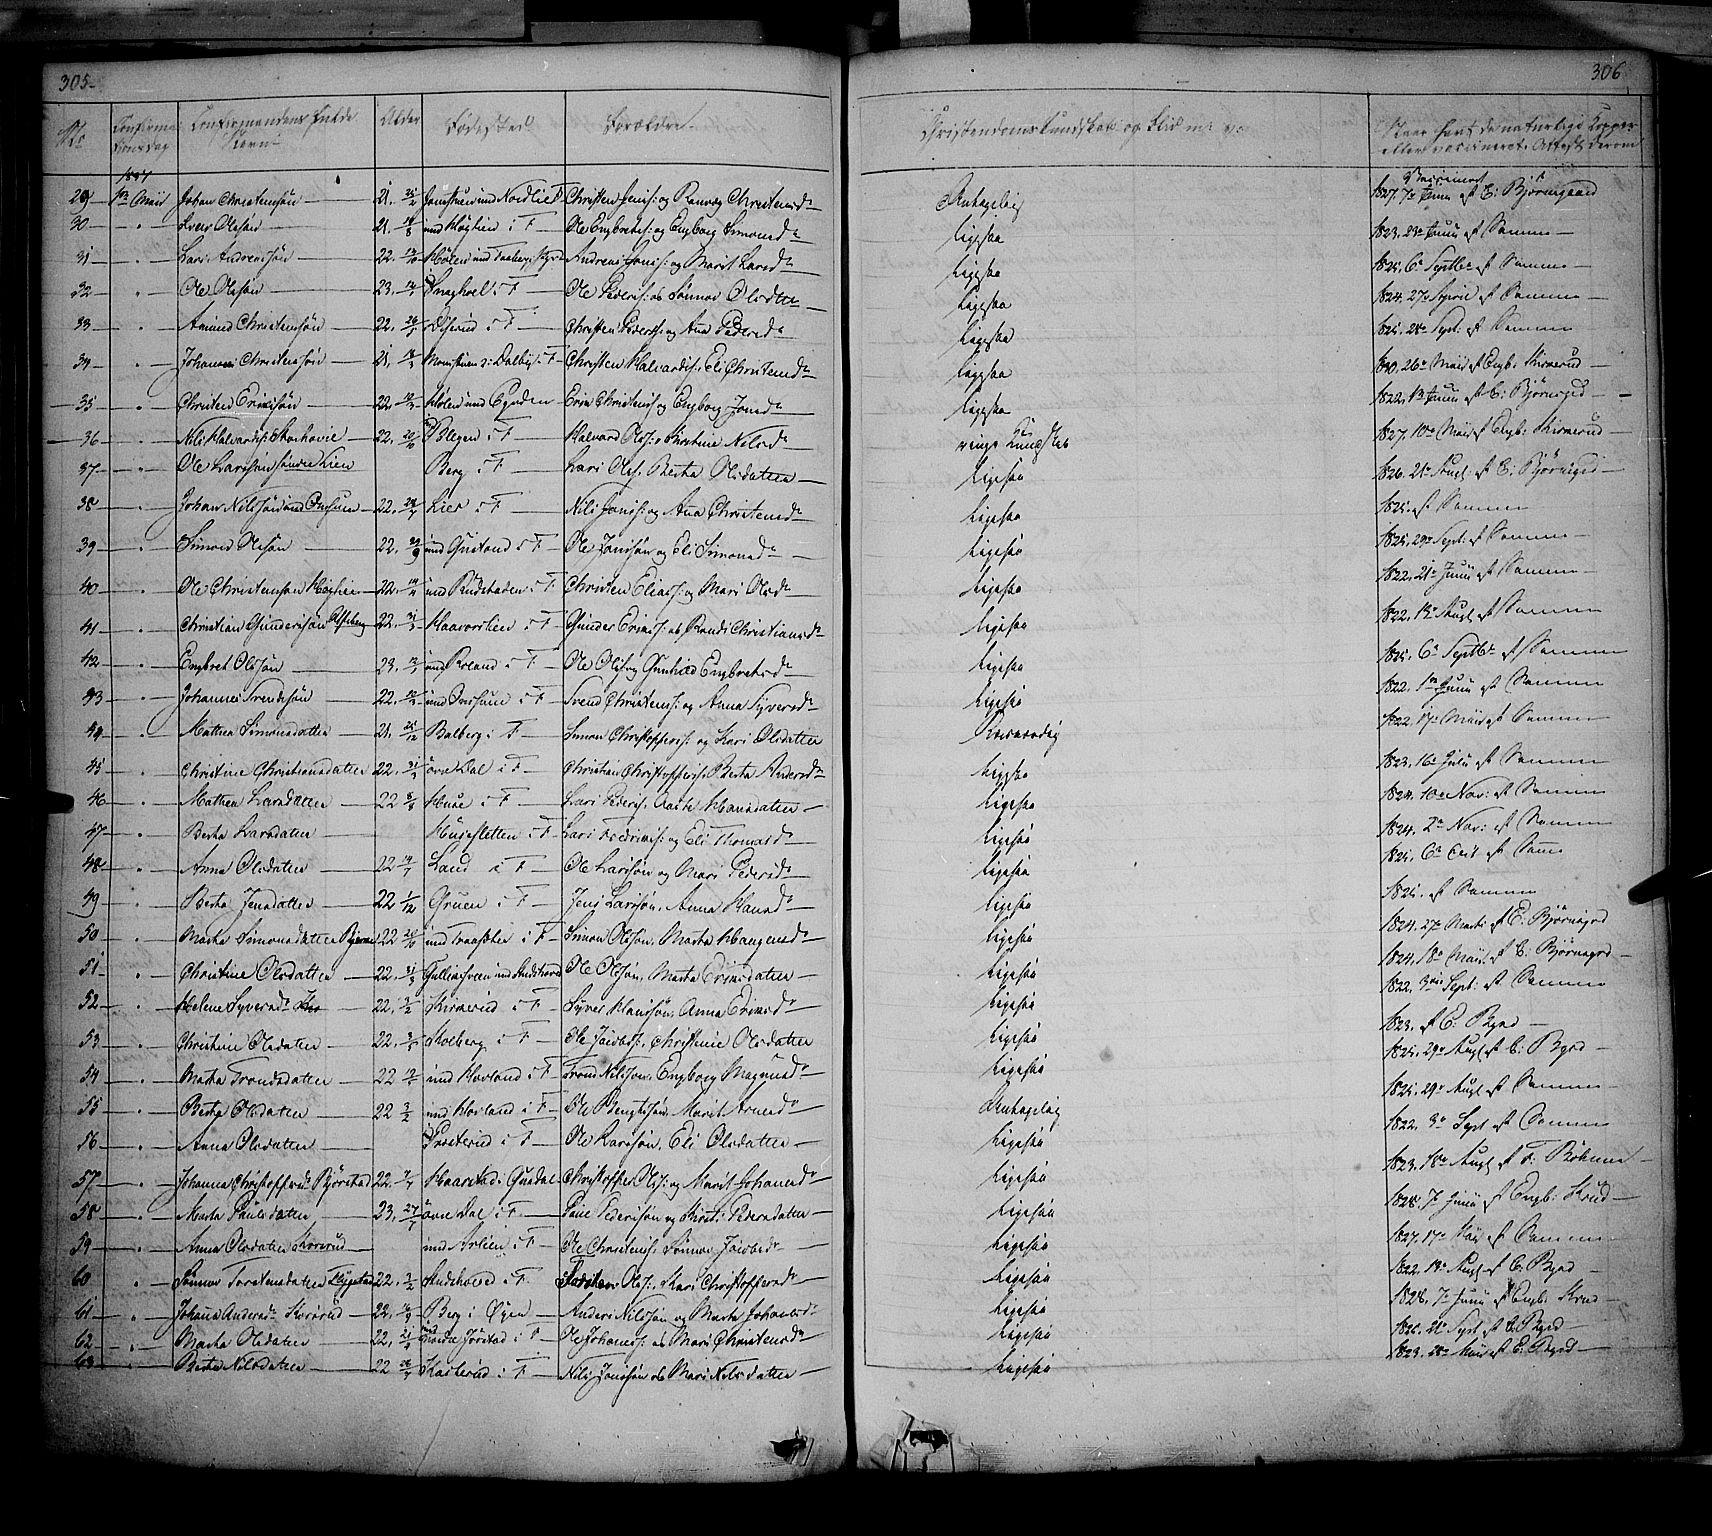 SAH, Fåberg prestekontor, Ministerialbok nr. 5, 1836-1854, s. 305-306